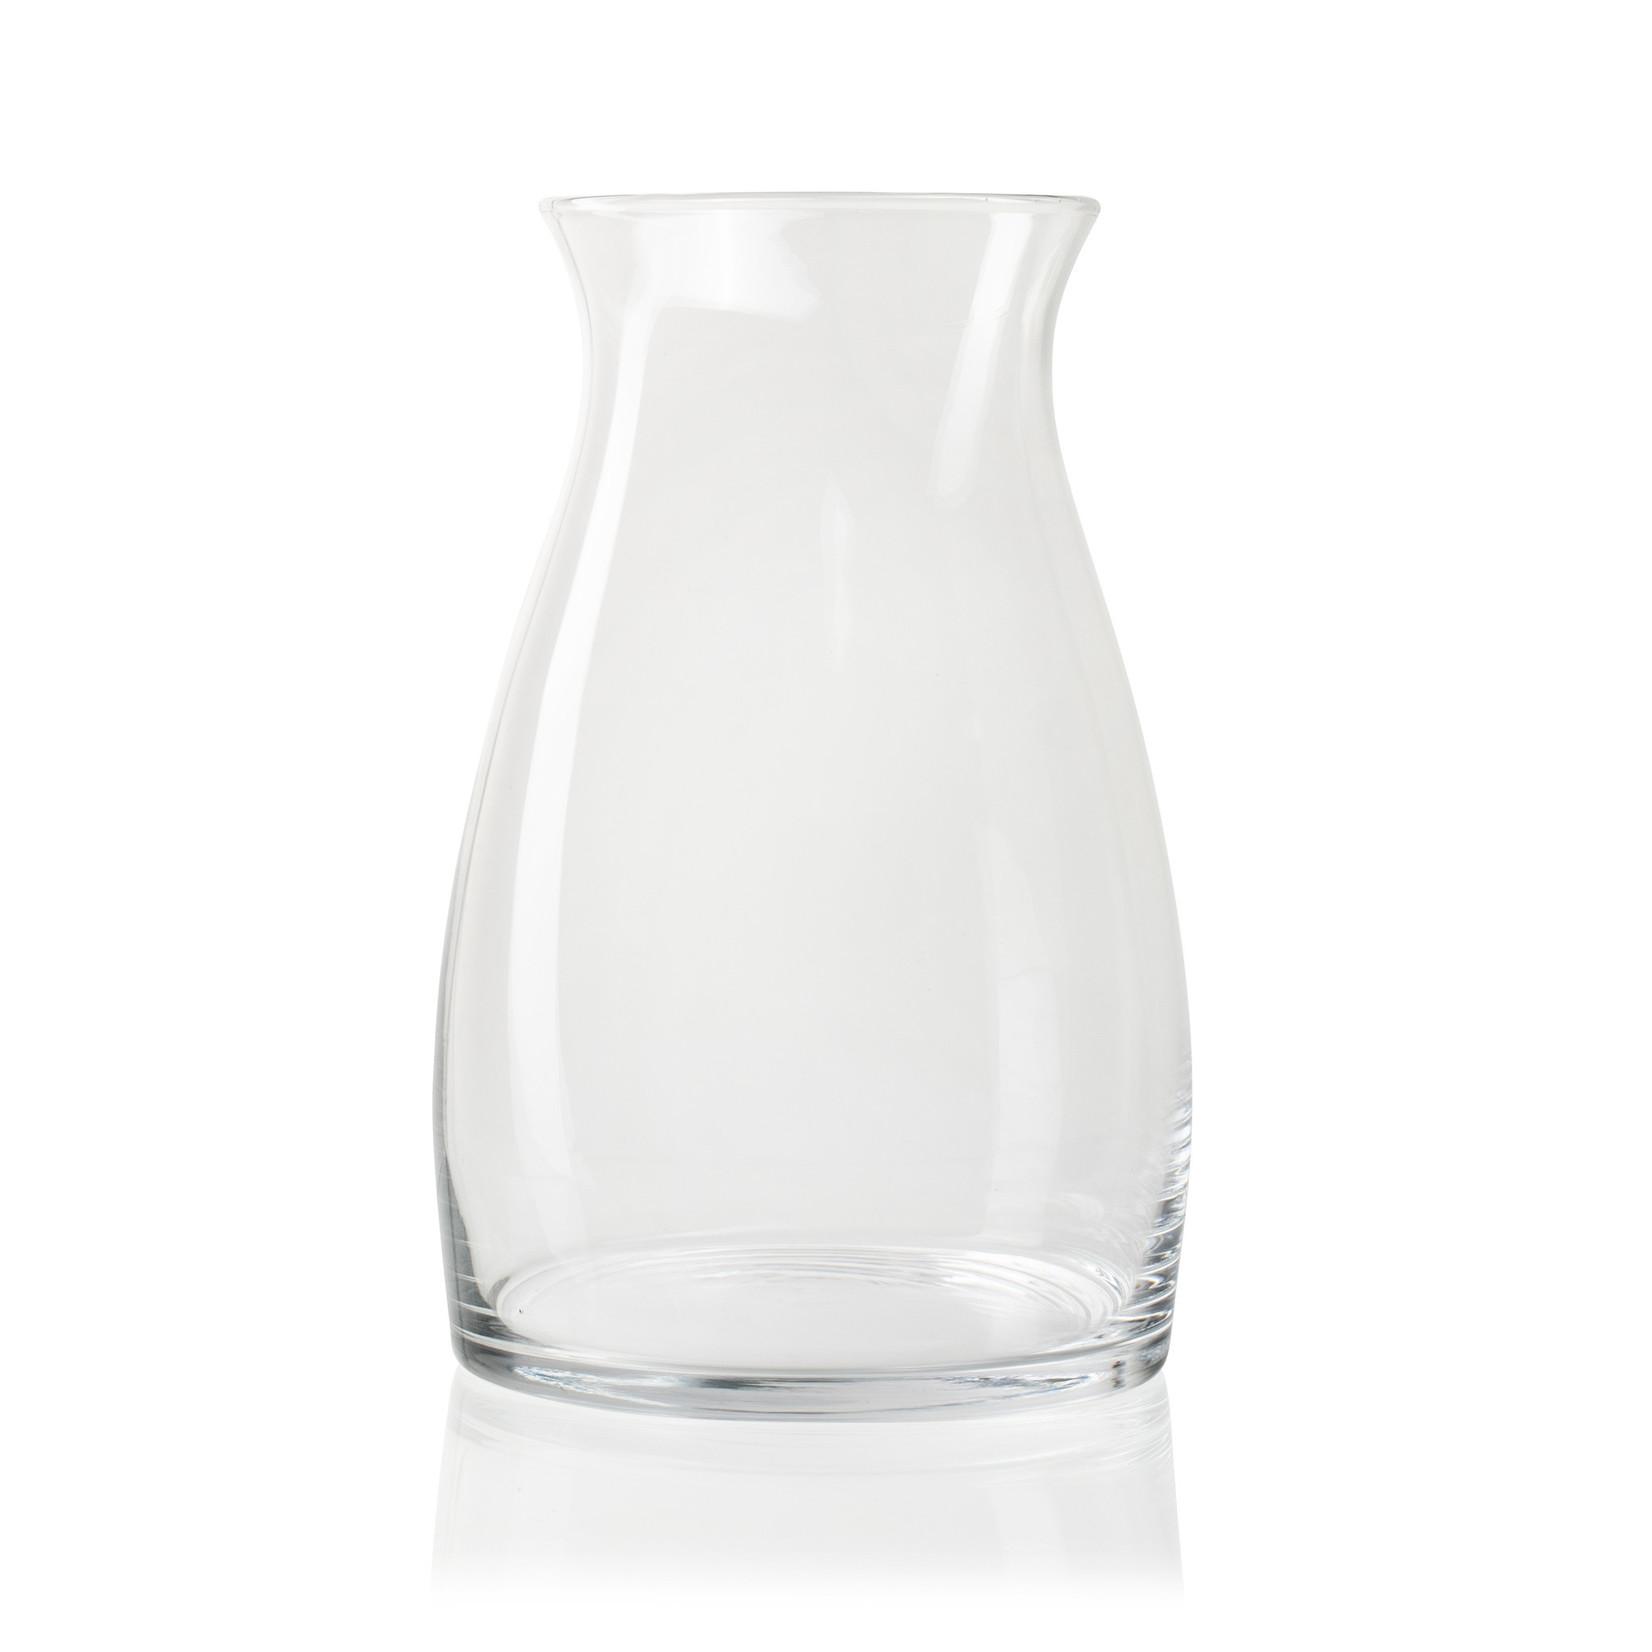 Jodeco Glass Glazen vaas 'Gina' H30 D15 cm Transparant